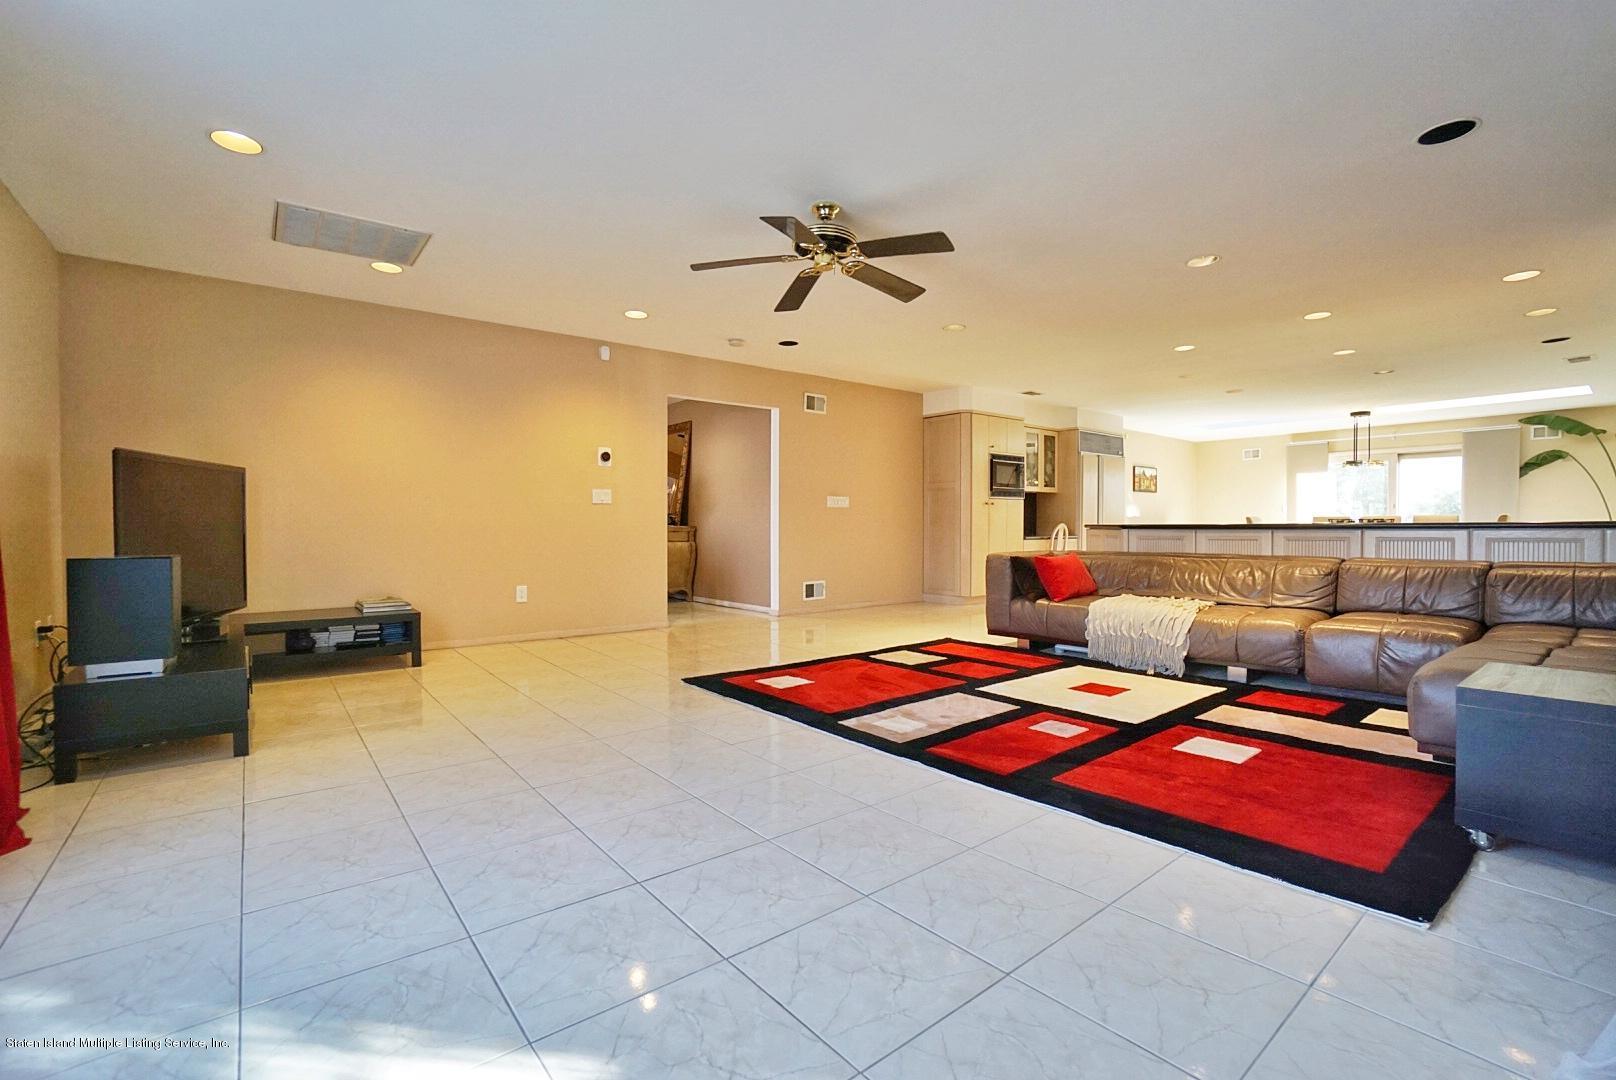 Single Family - Detached 183 Kensington Avenue  Staten Island, NY 10305, MLS-1127107-13